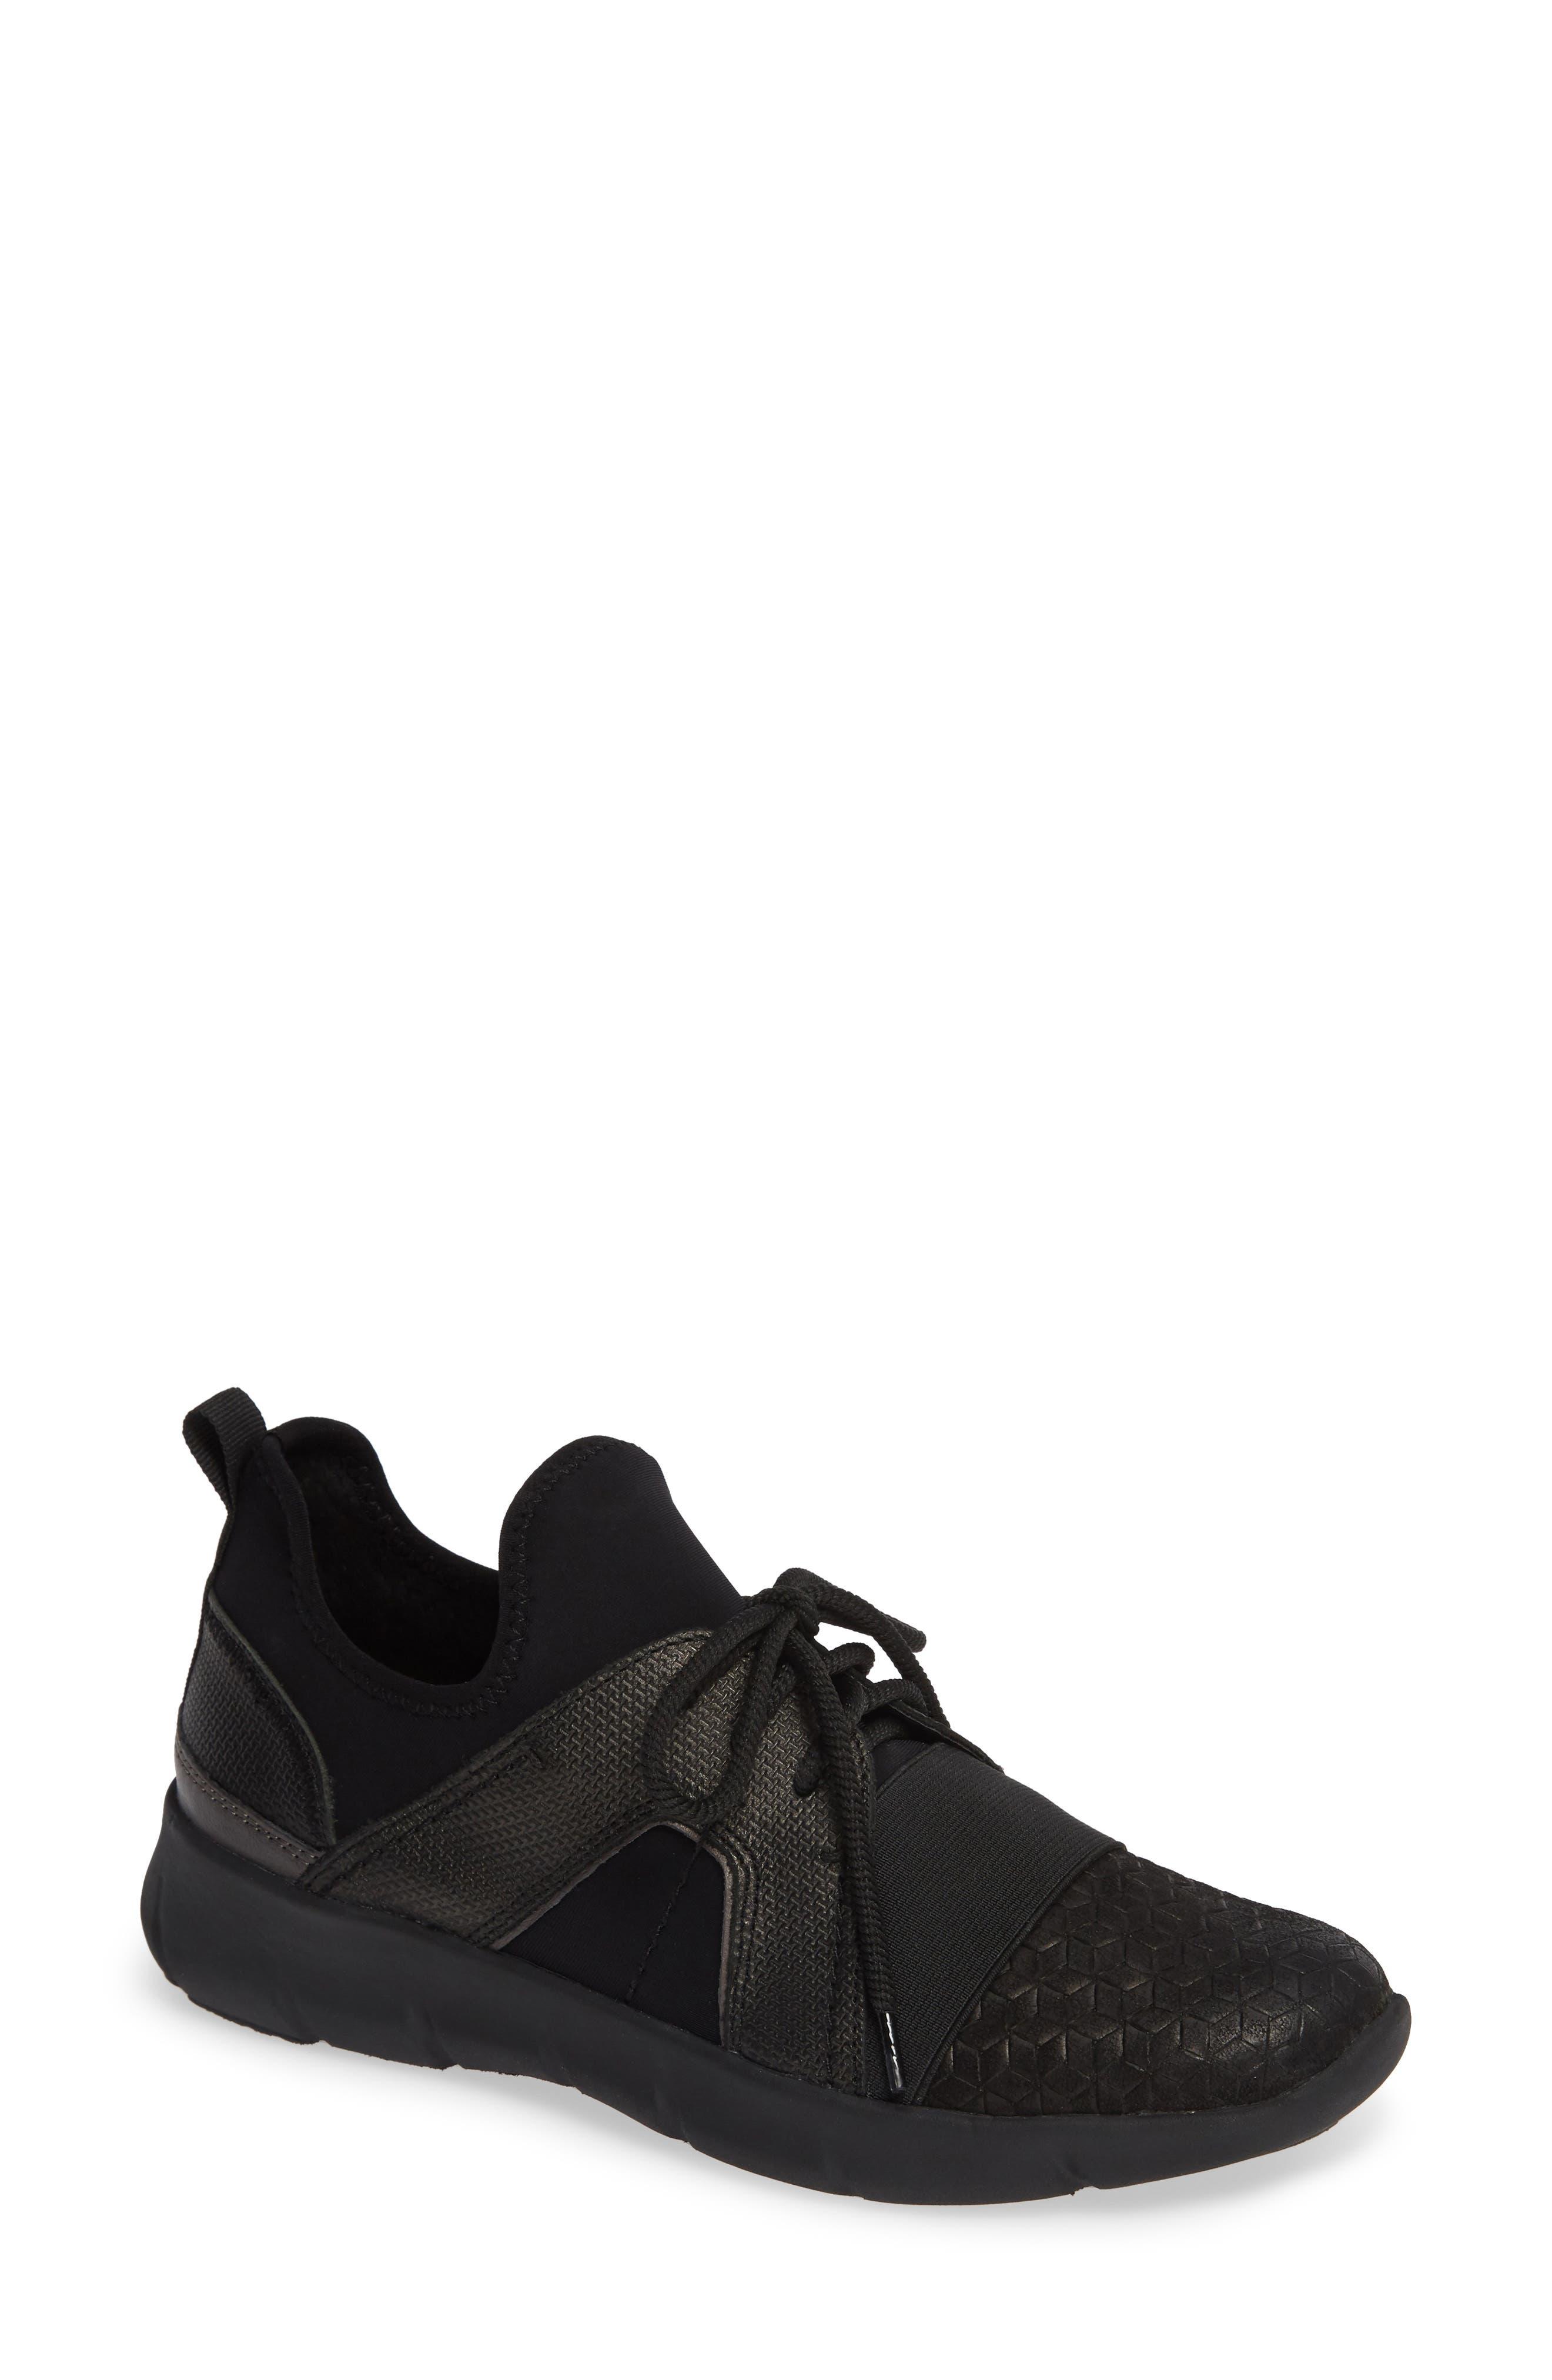 Transfer Sneaker,                             Main thumbnail 1, color,                             BLACK